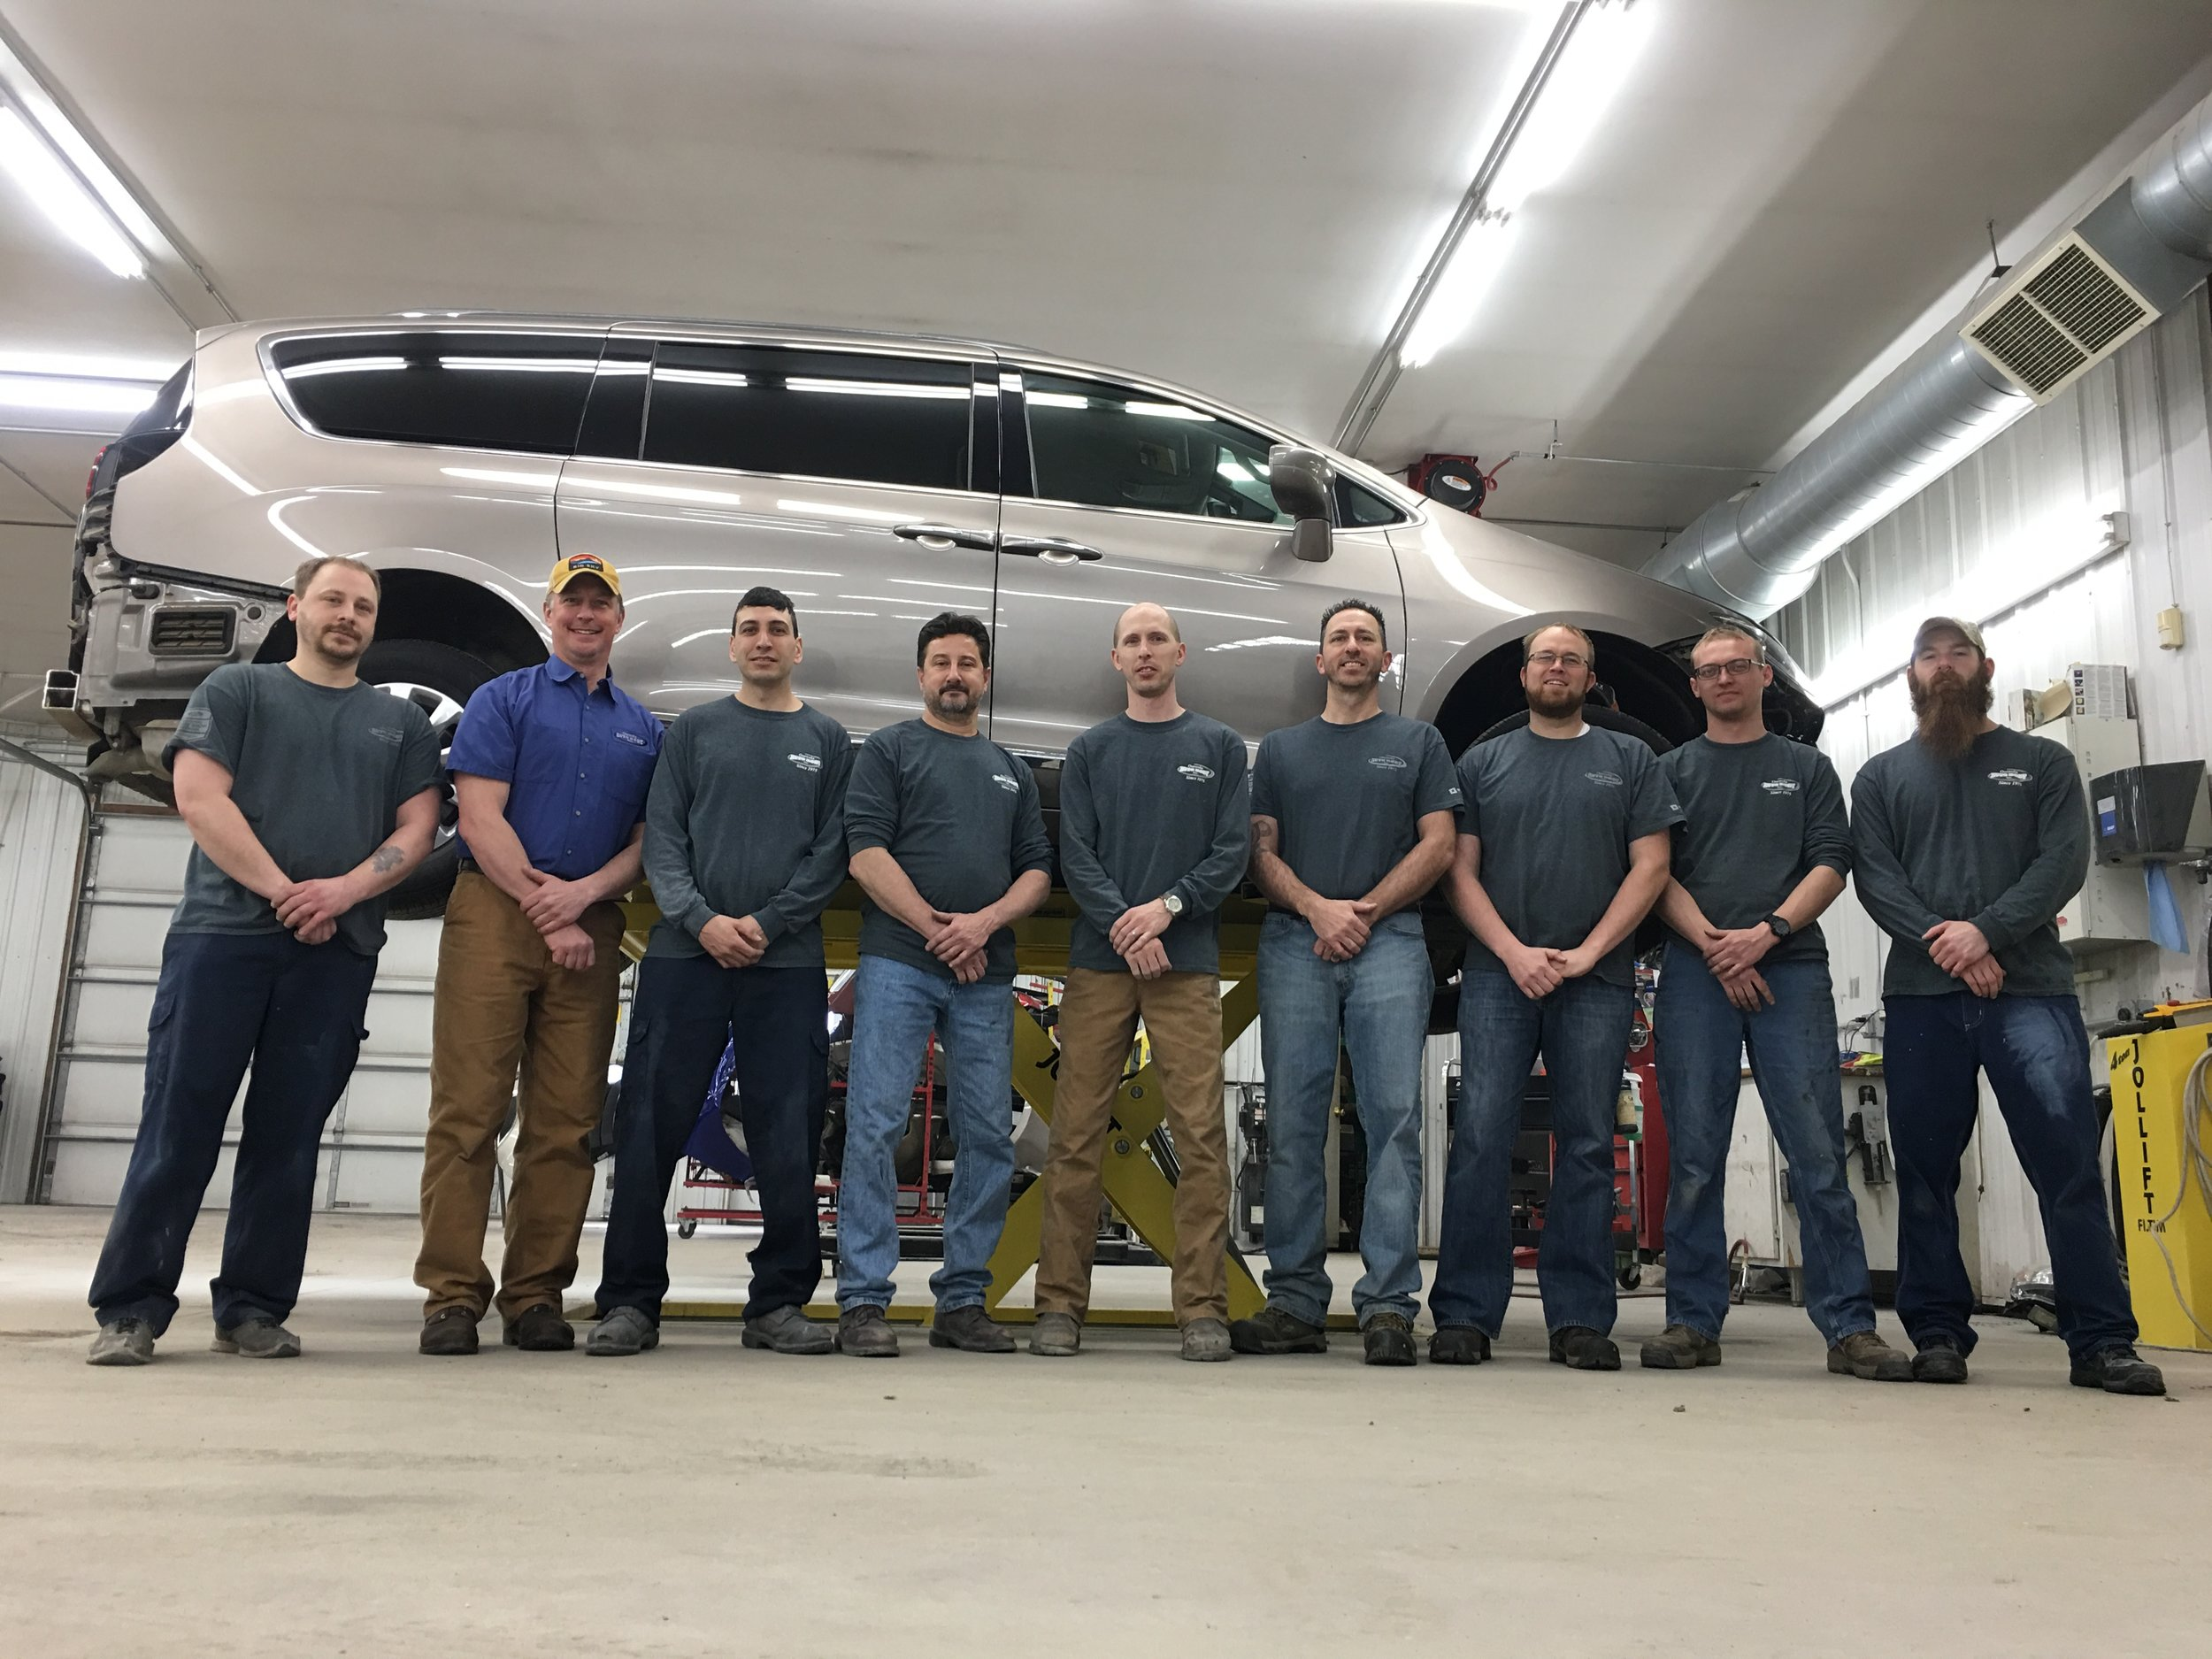 The staff at Osceola Auto Body